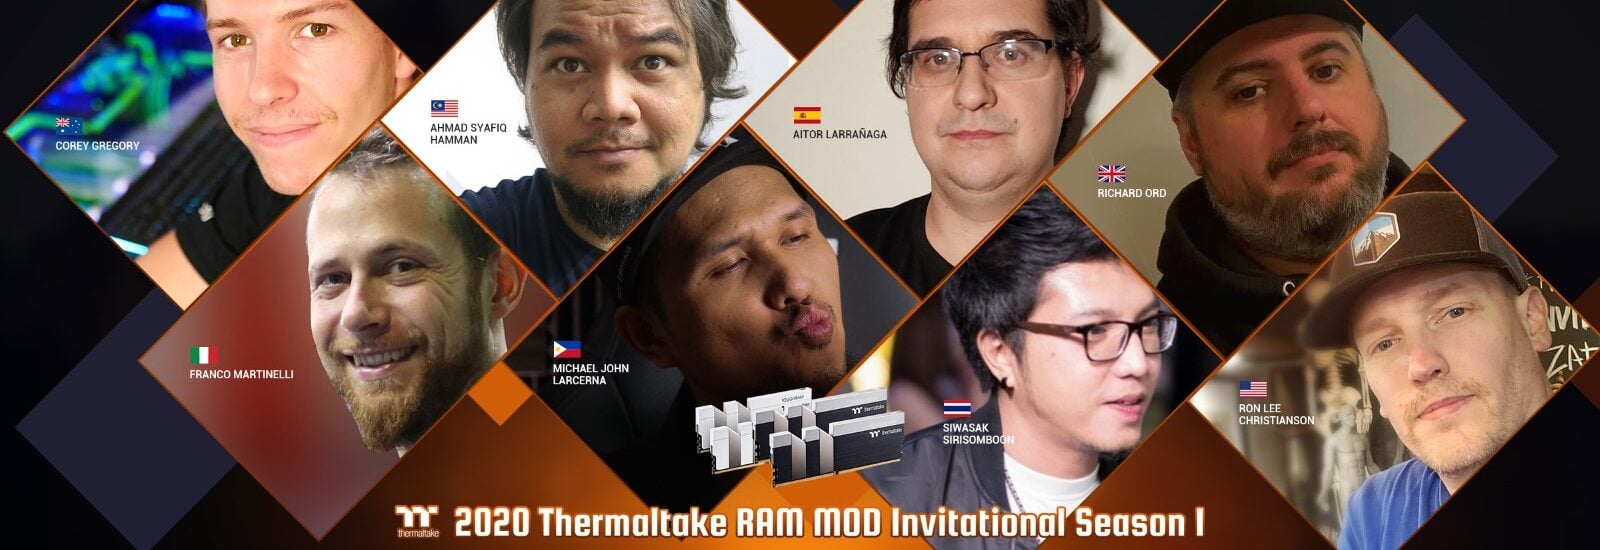 2020-as Thermaltake RAM MOD Invitational verseny 1. évad